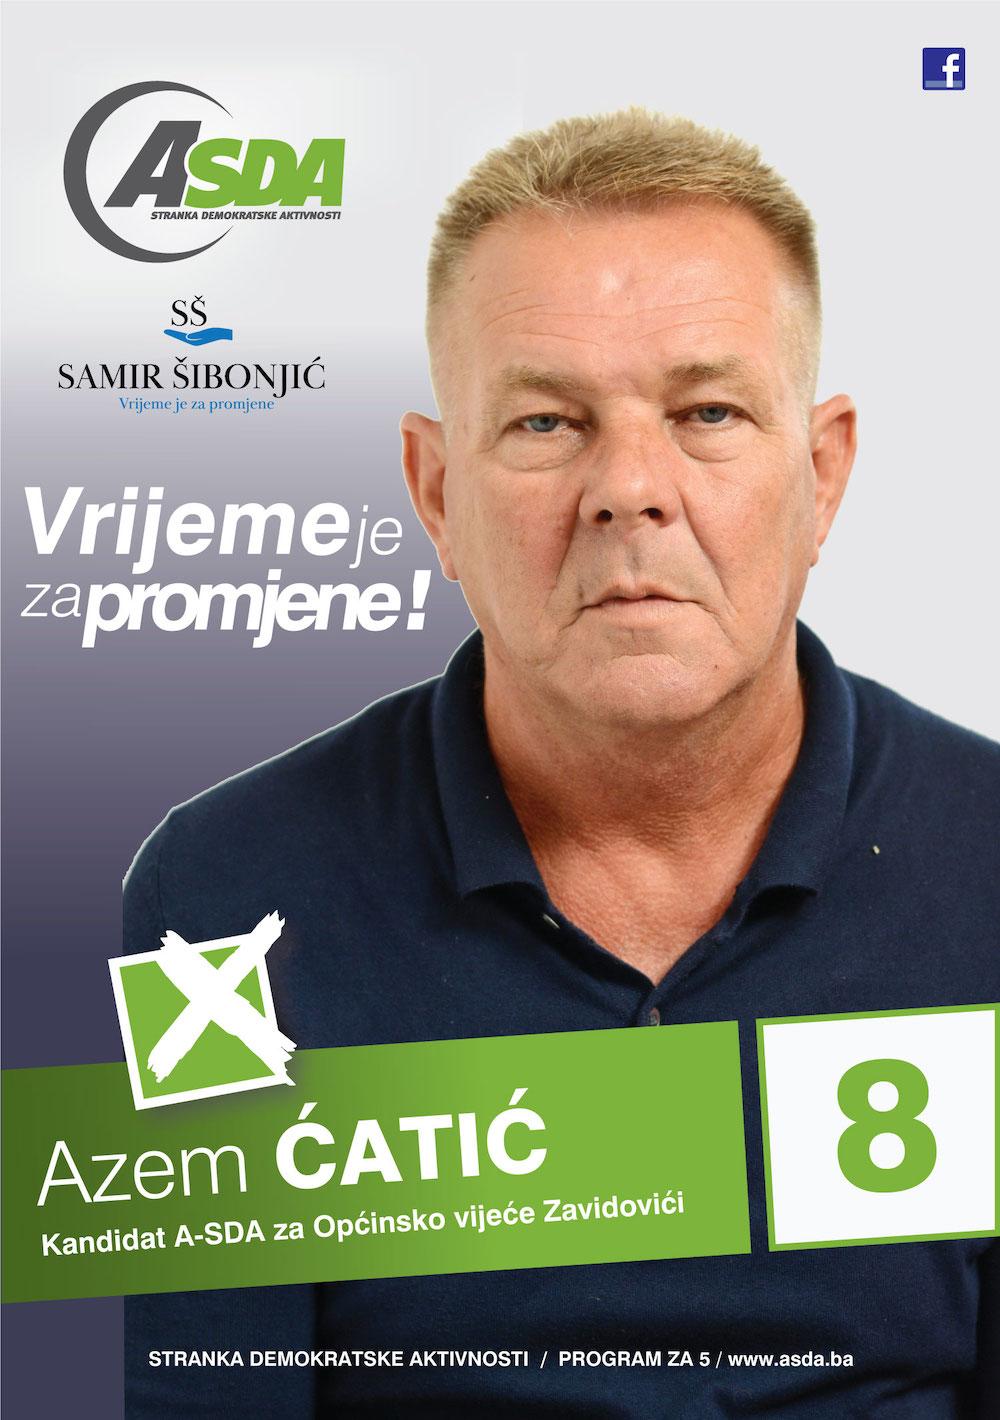 Azem Ćatić